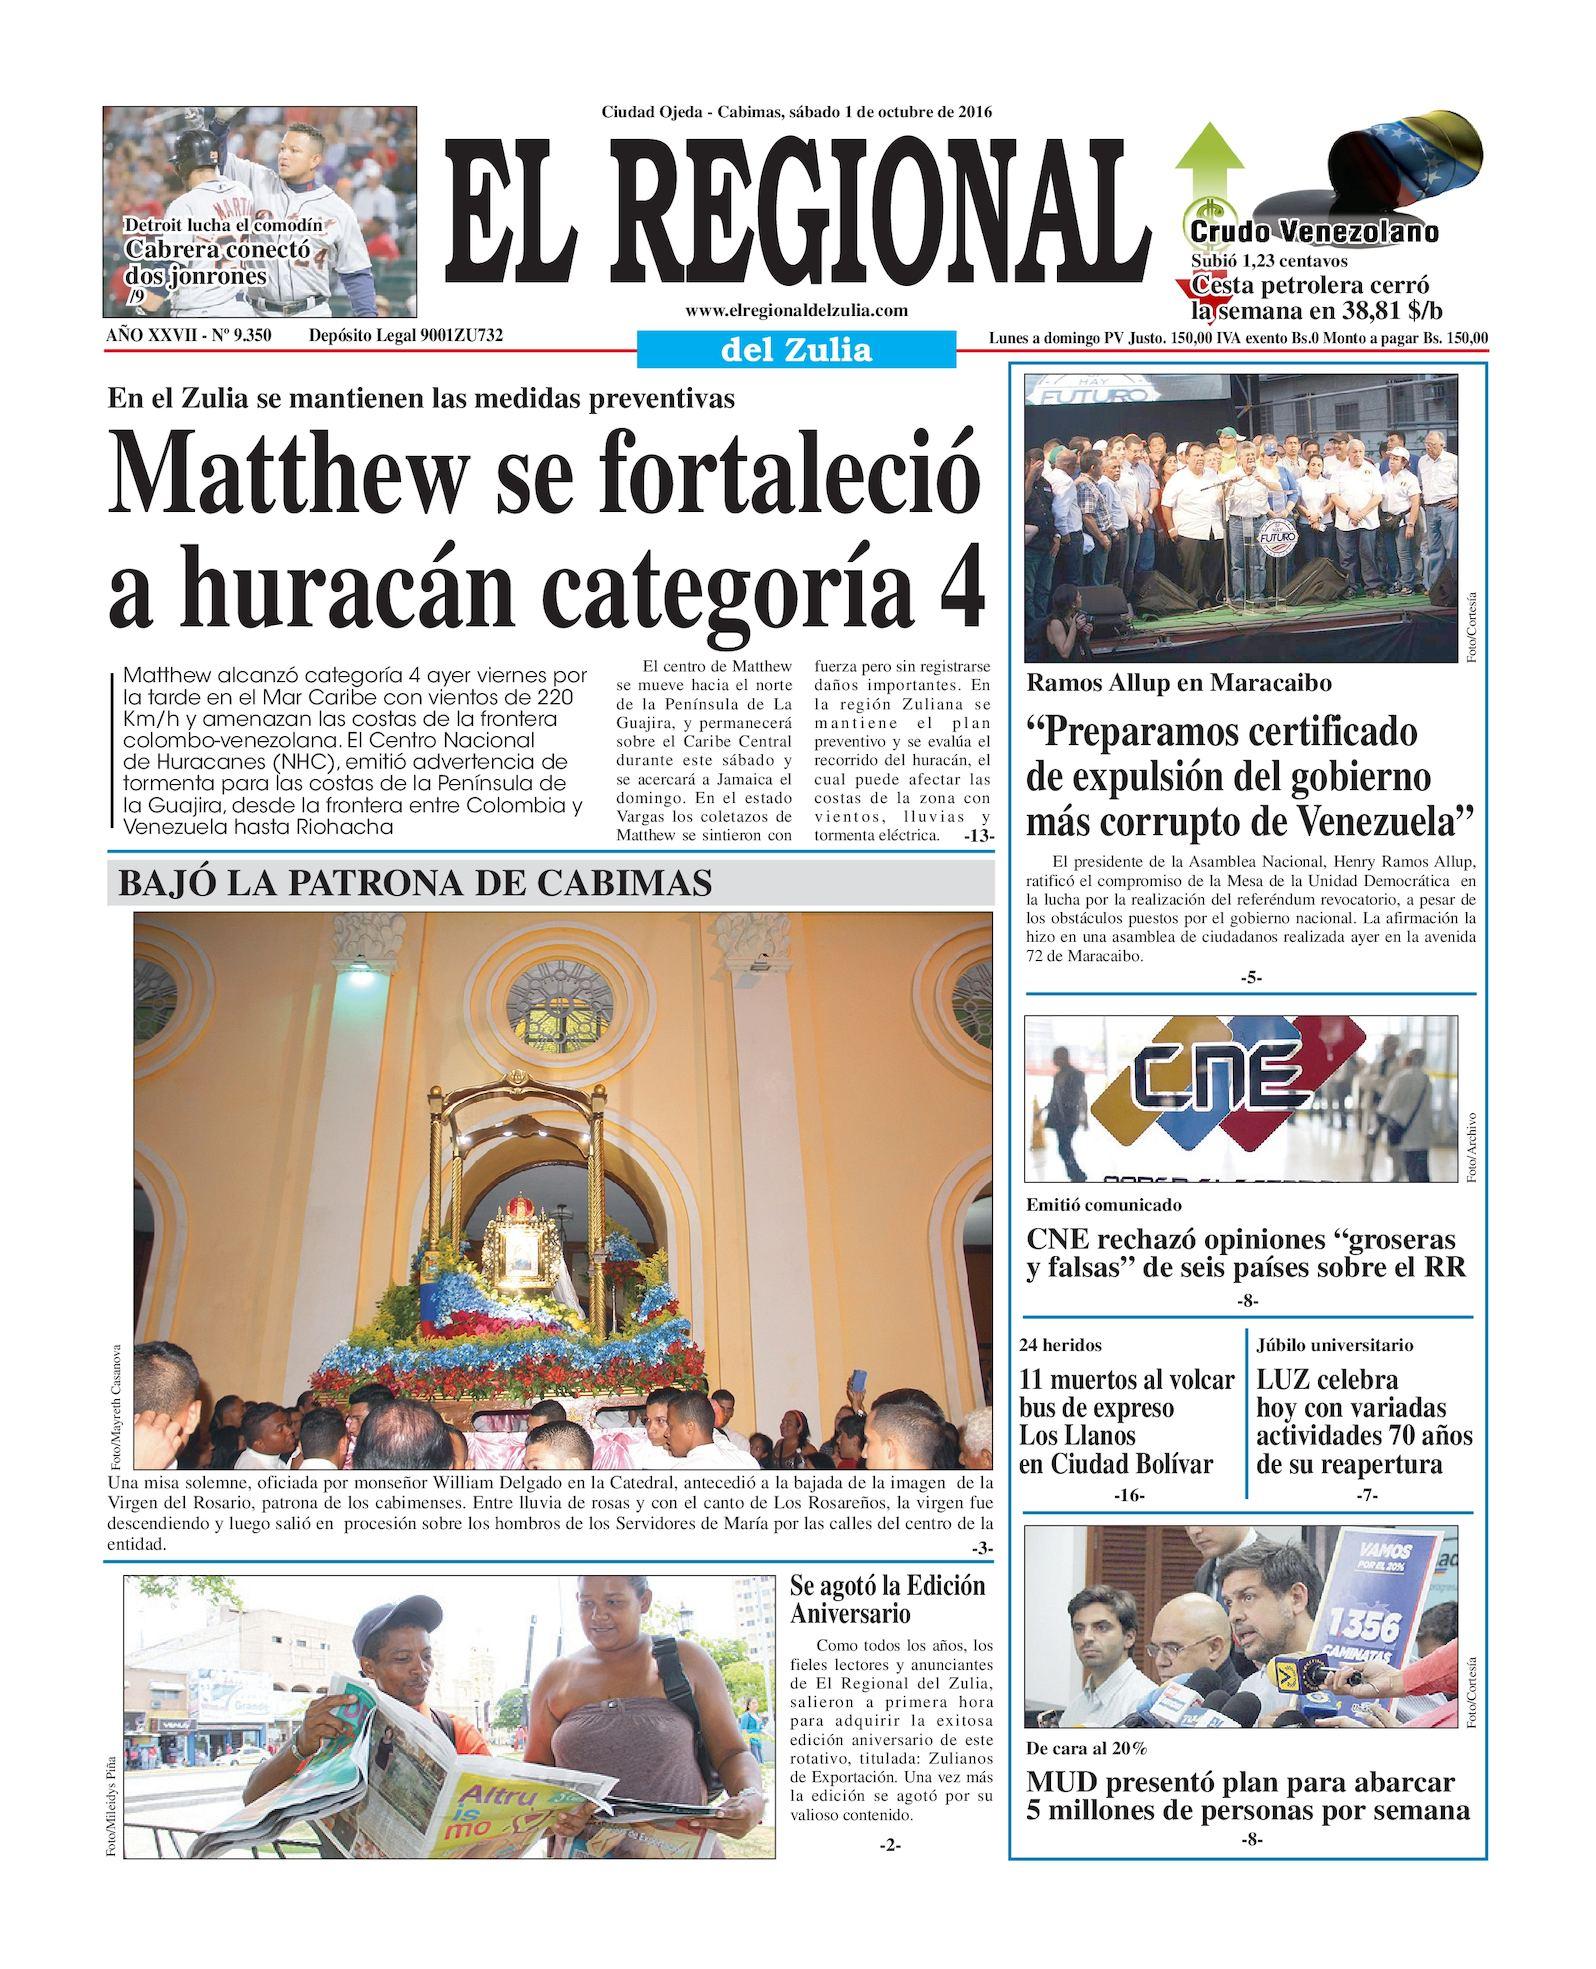 Calaméo - El Regional del zulia 01-10-2016